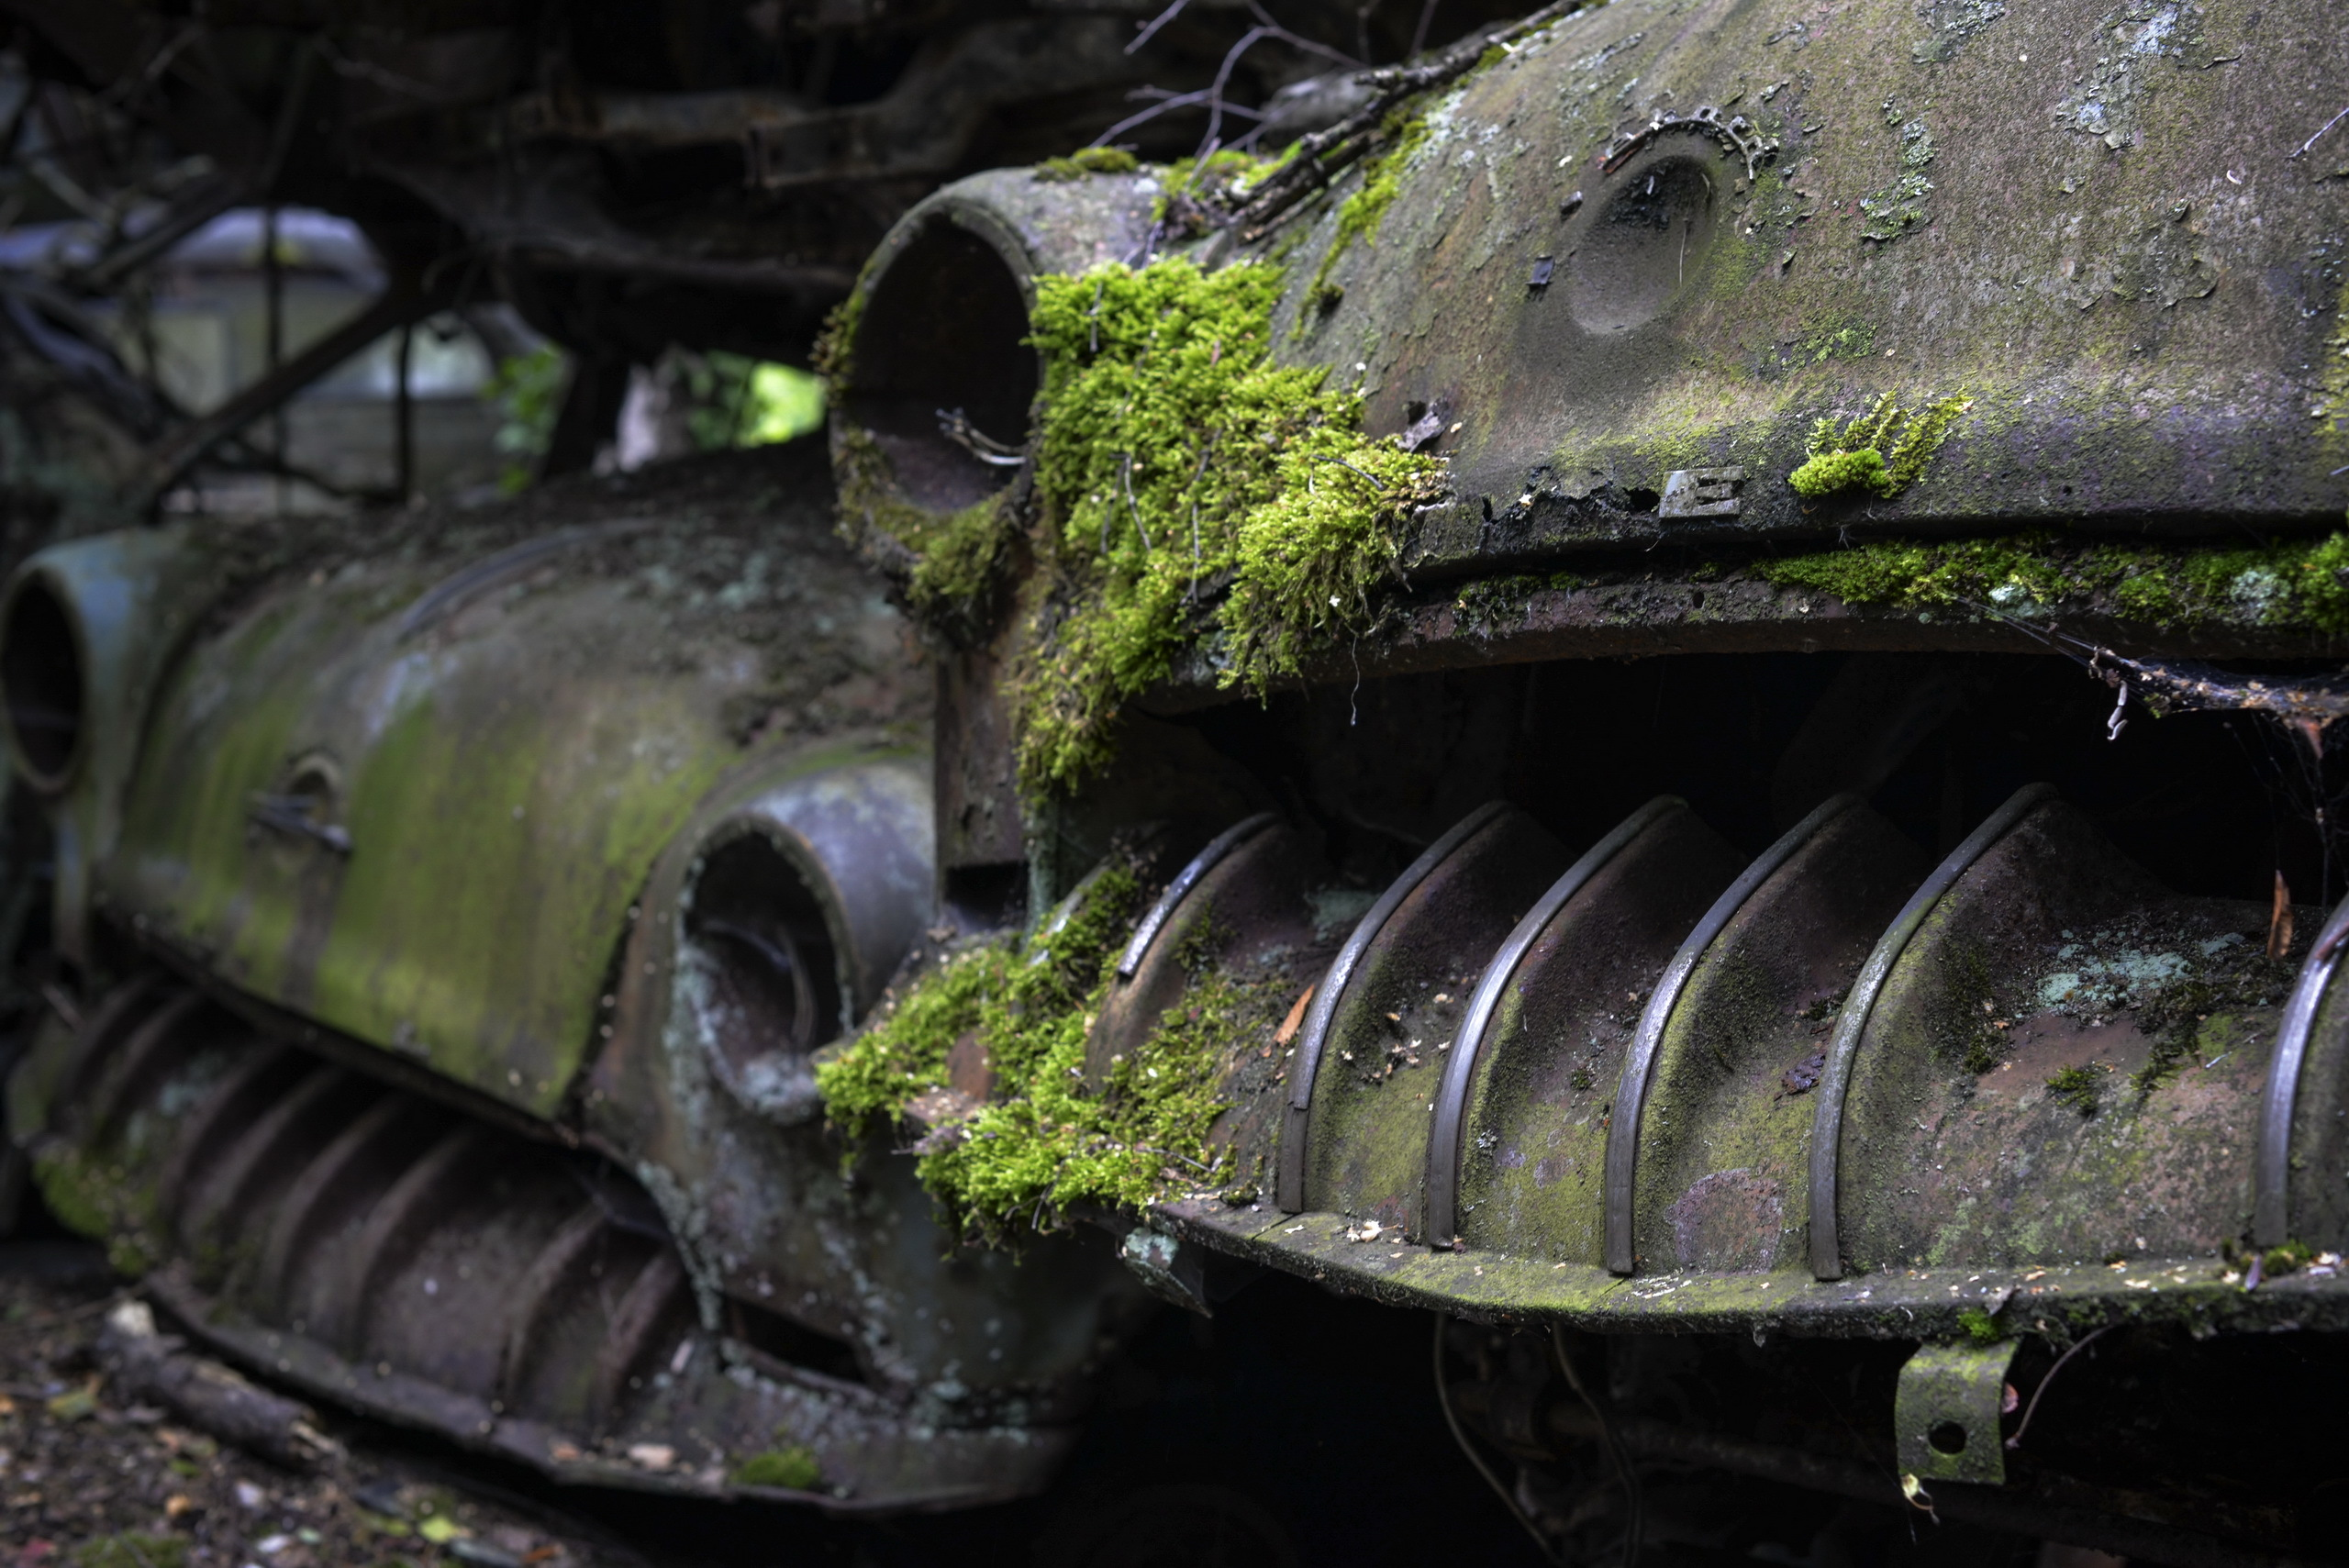 General 2560x1709 car moss vehicle rust wreck